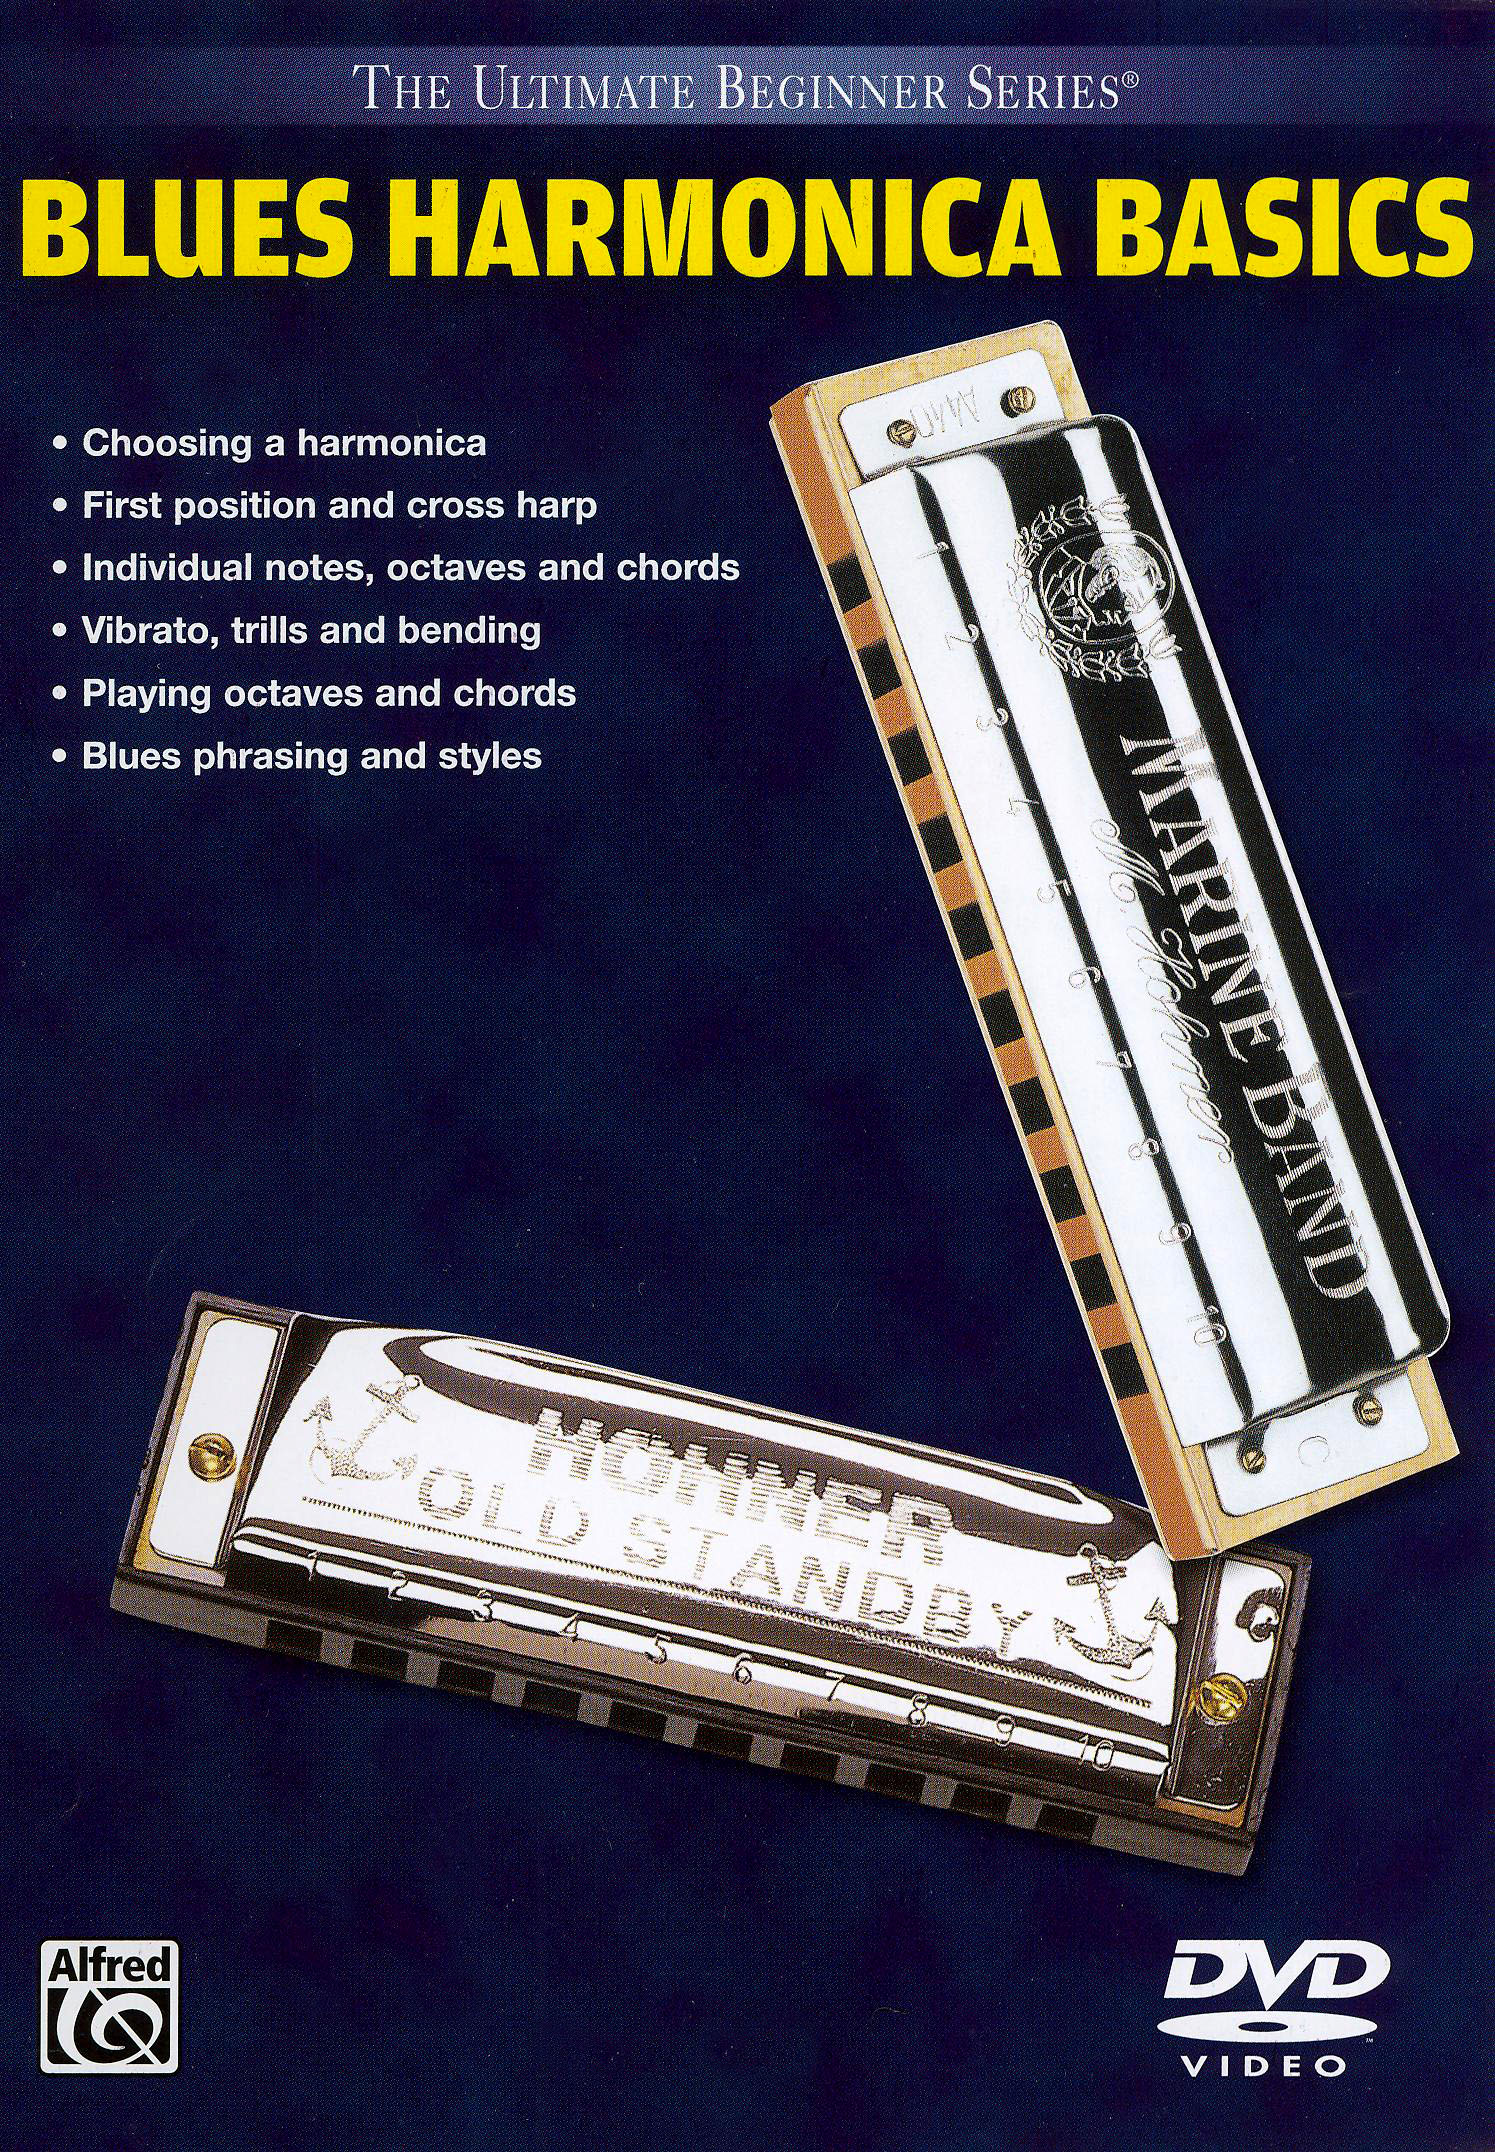 Ultimate Beginner: Blues Harmonica